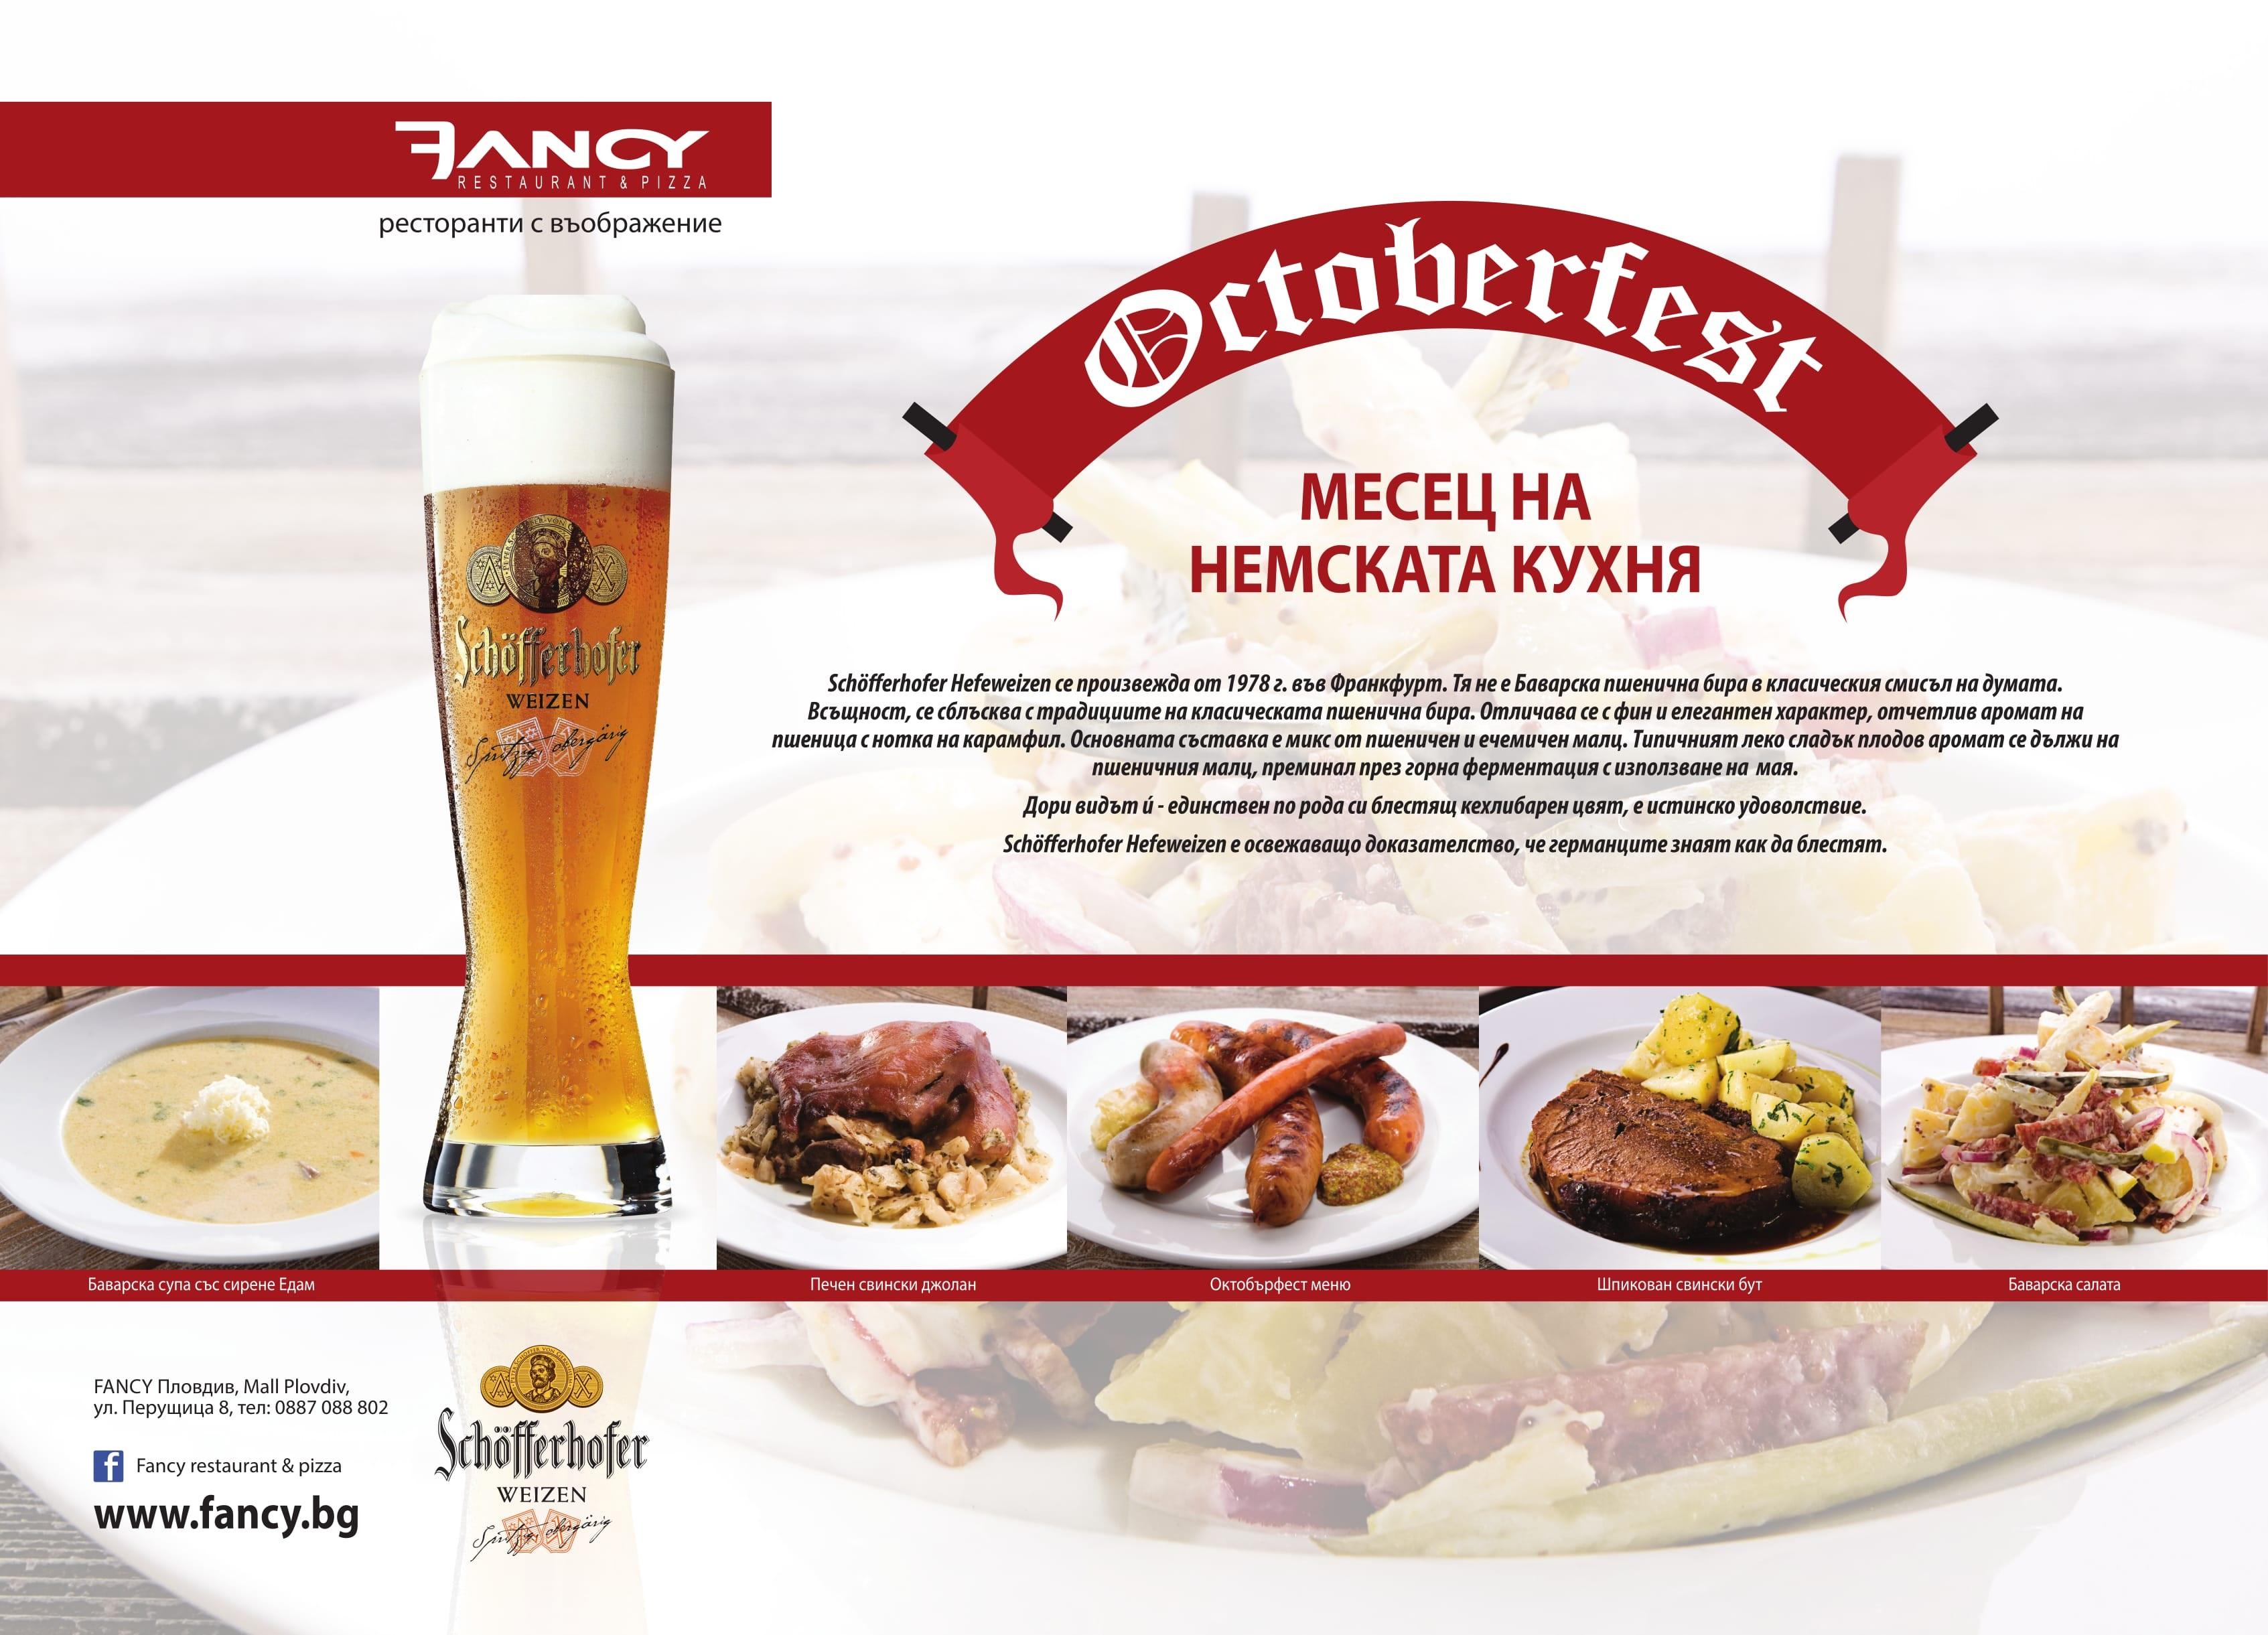 A month of German cuisine in restaurant Fancy